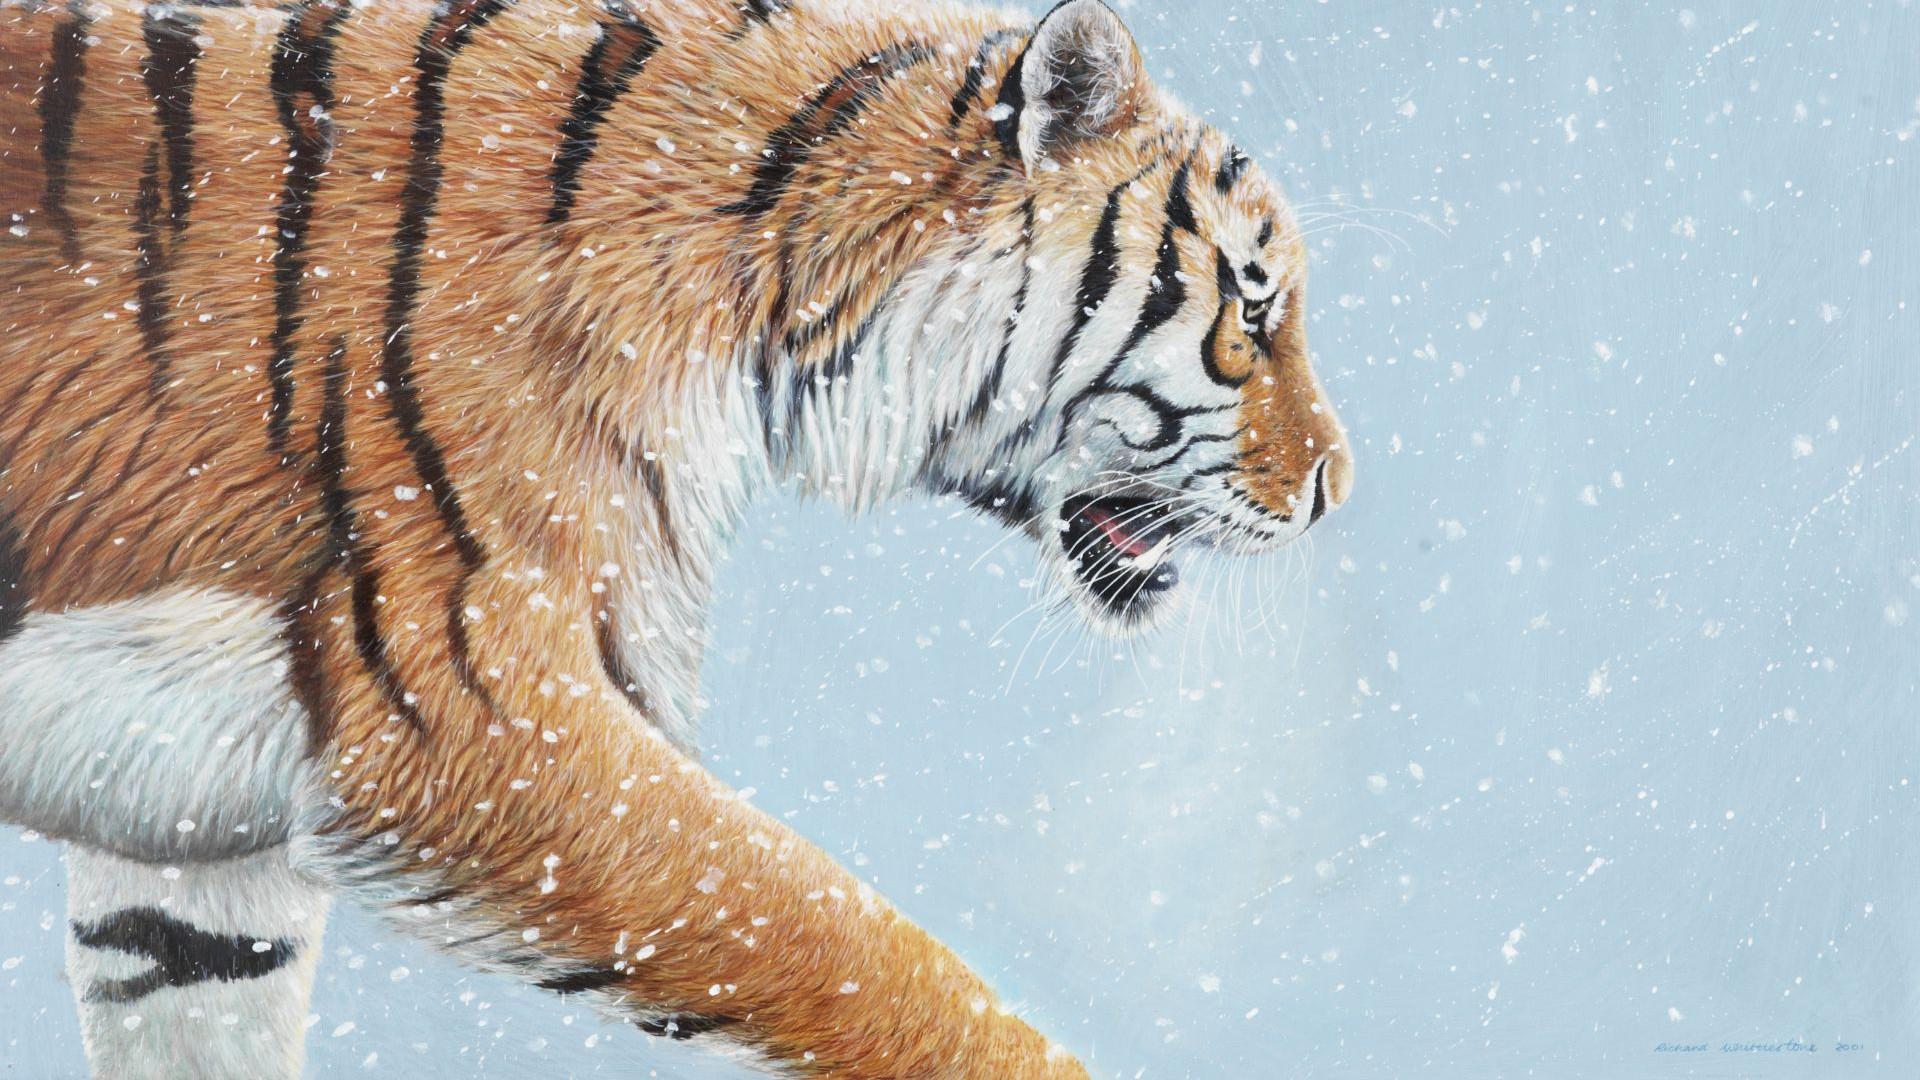 Richard-Whittlestone-Cards-Snow-Patrol